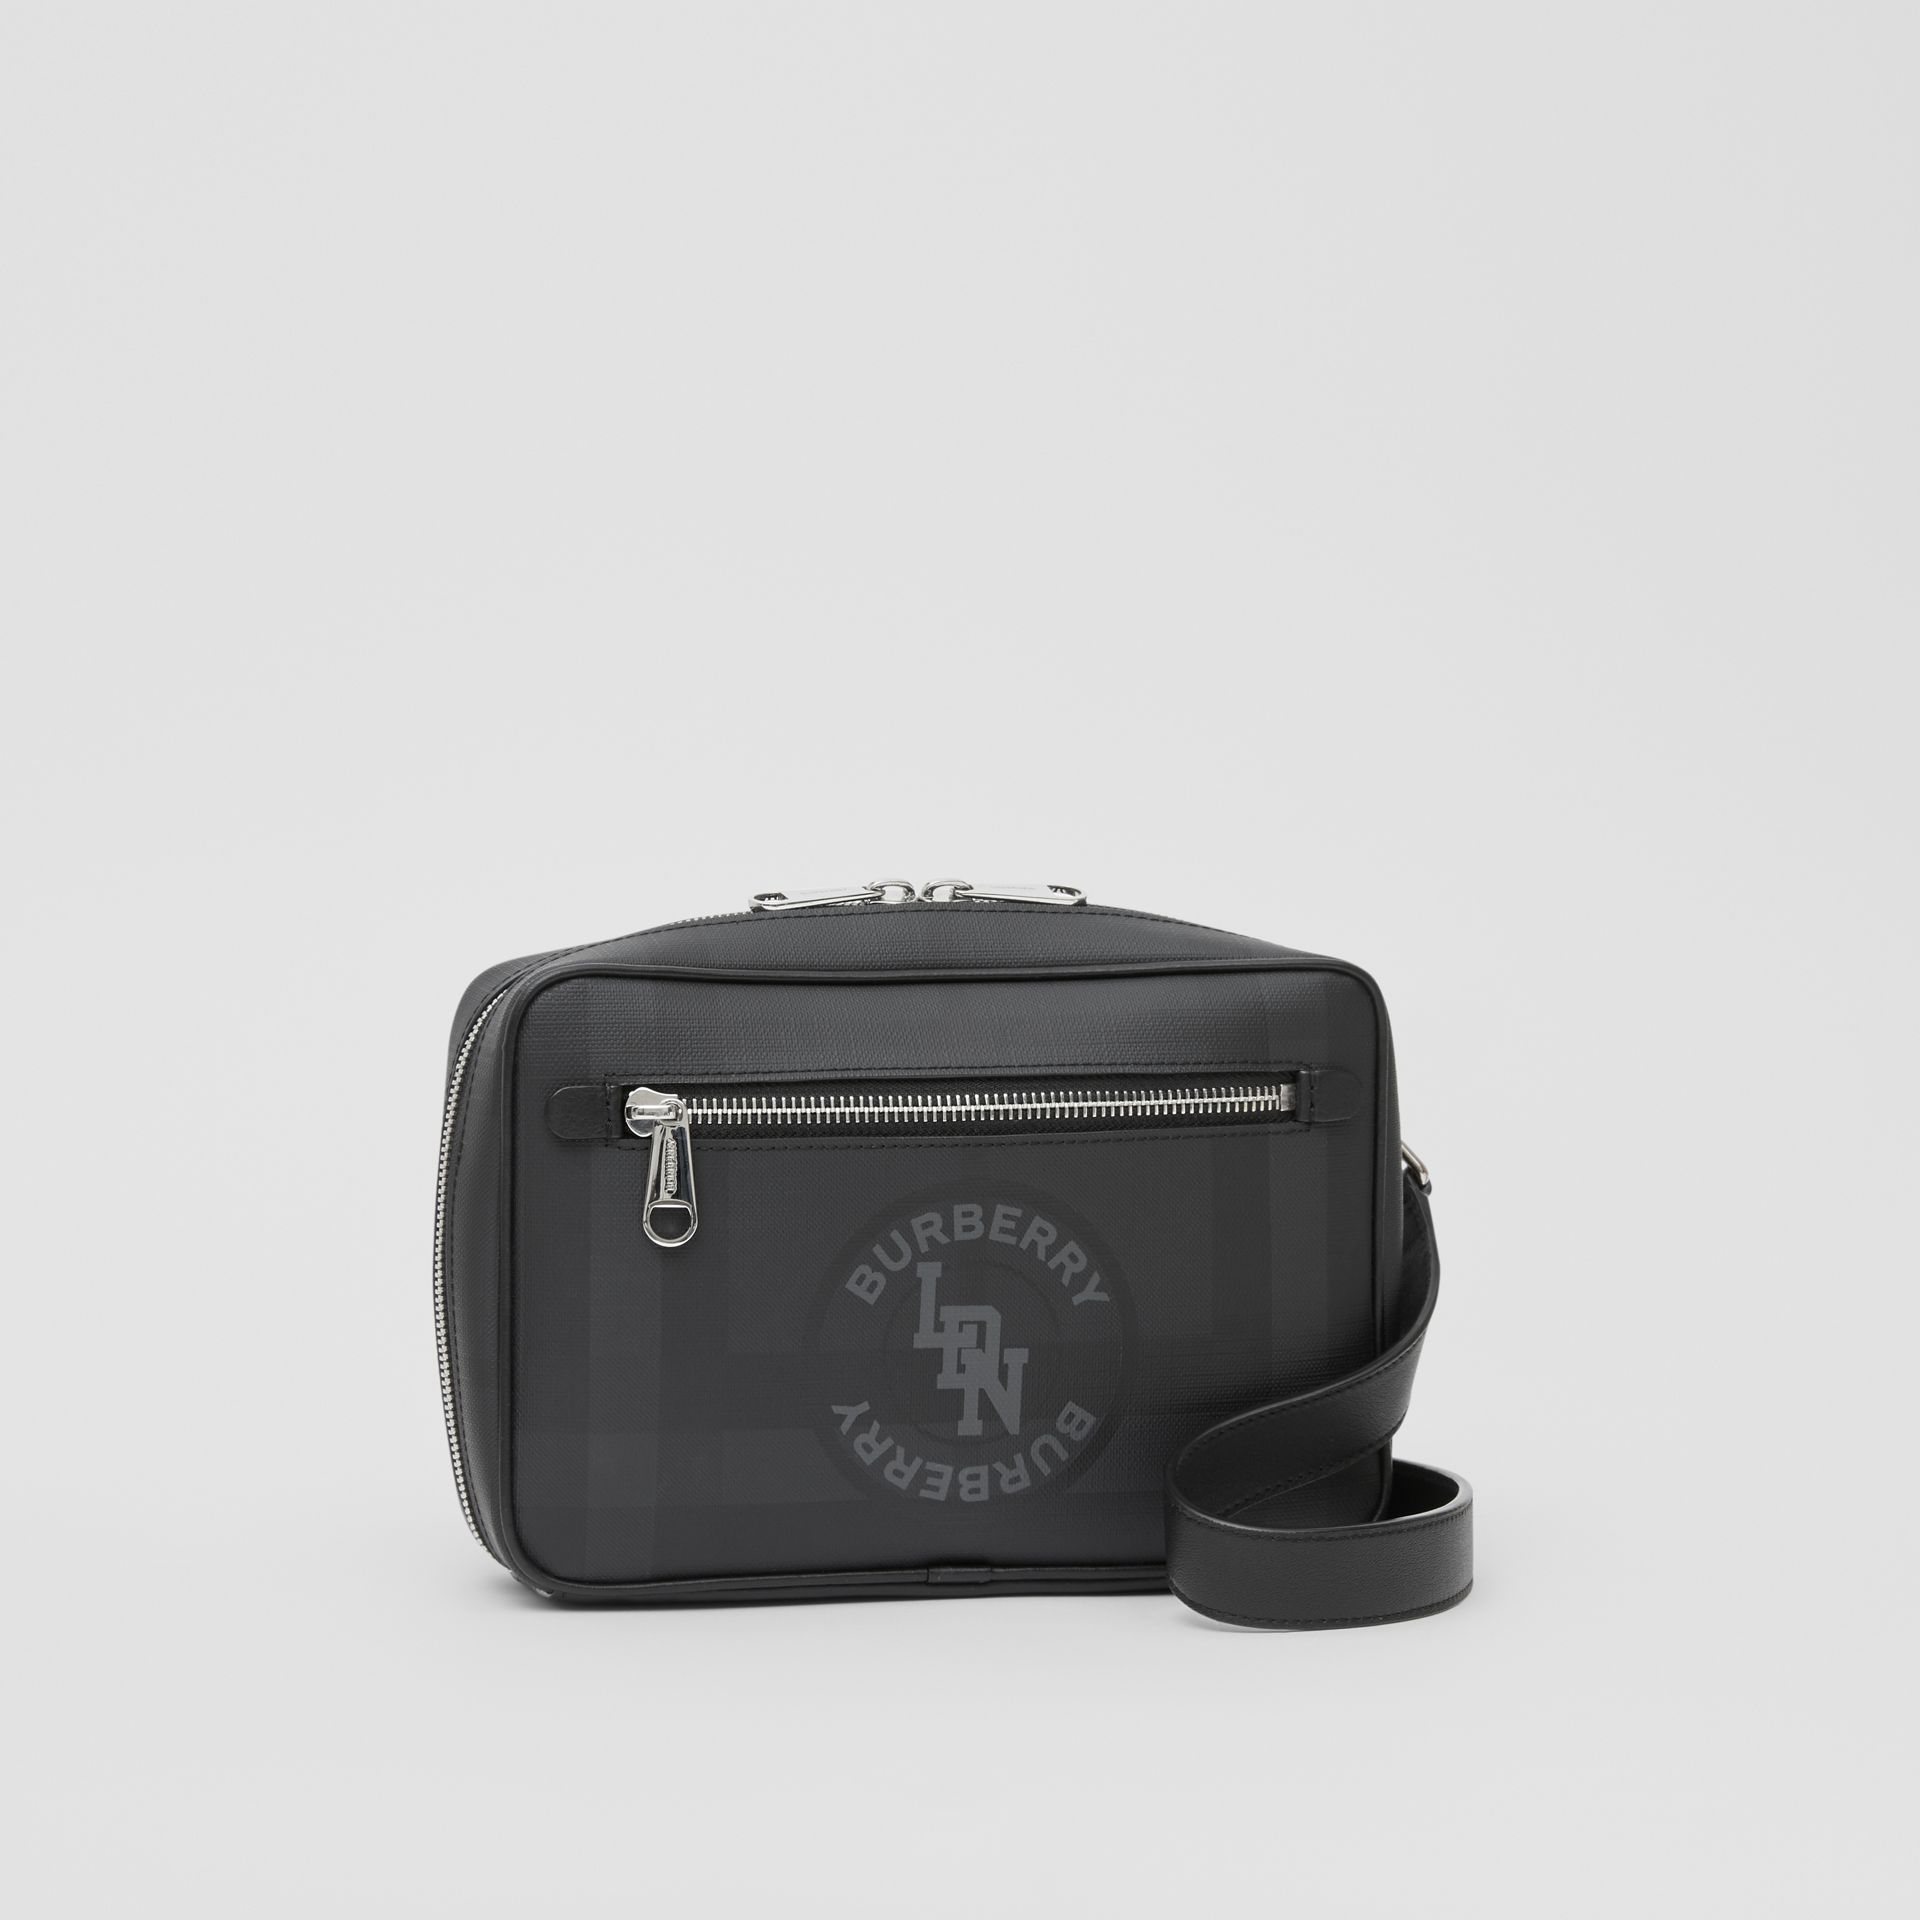 Logo Graphic London Check Crossbody Bag in Dark Charcoal - Men | Burberry United Kingdom - gallery image 6